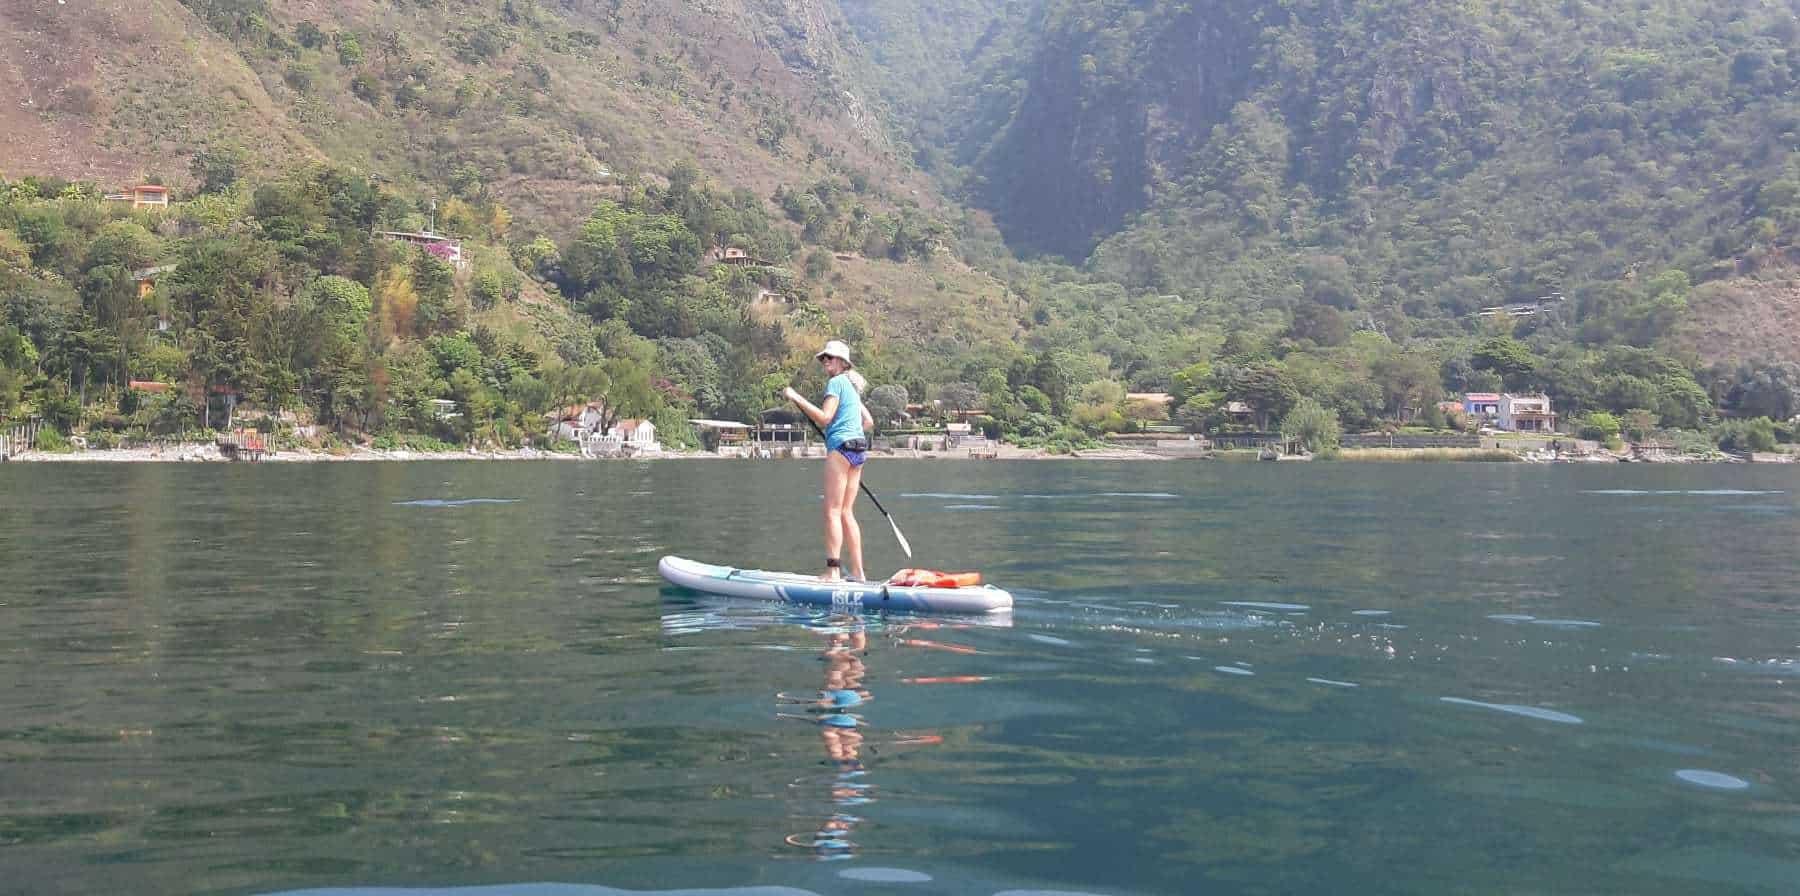 Traci paddleboarding for the first time in Santa Cruz La Laguna